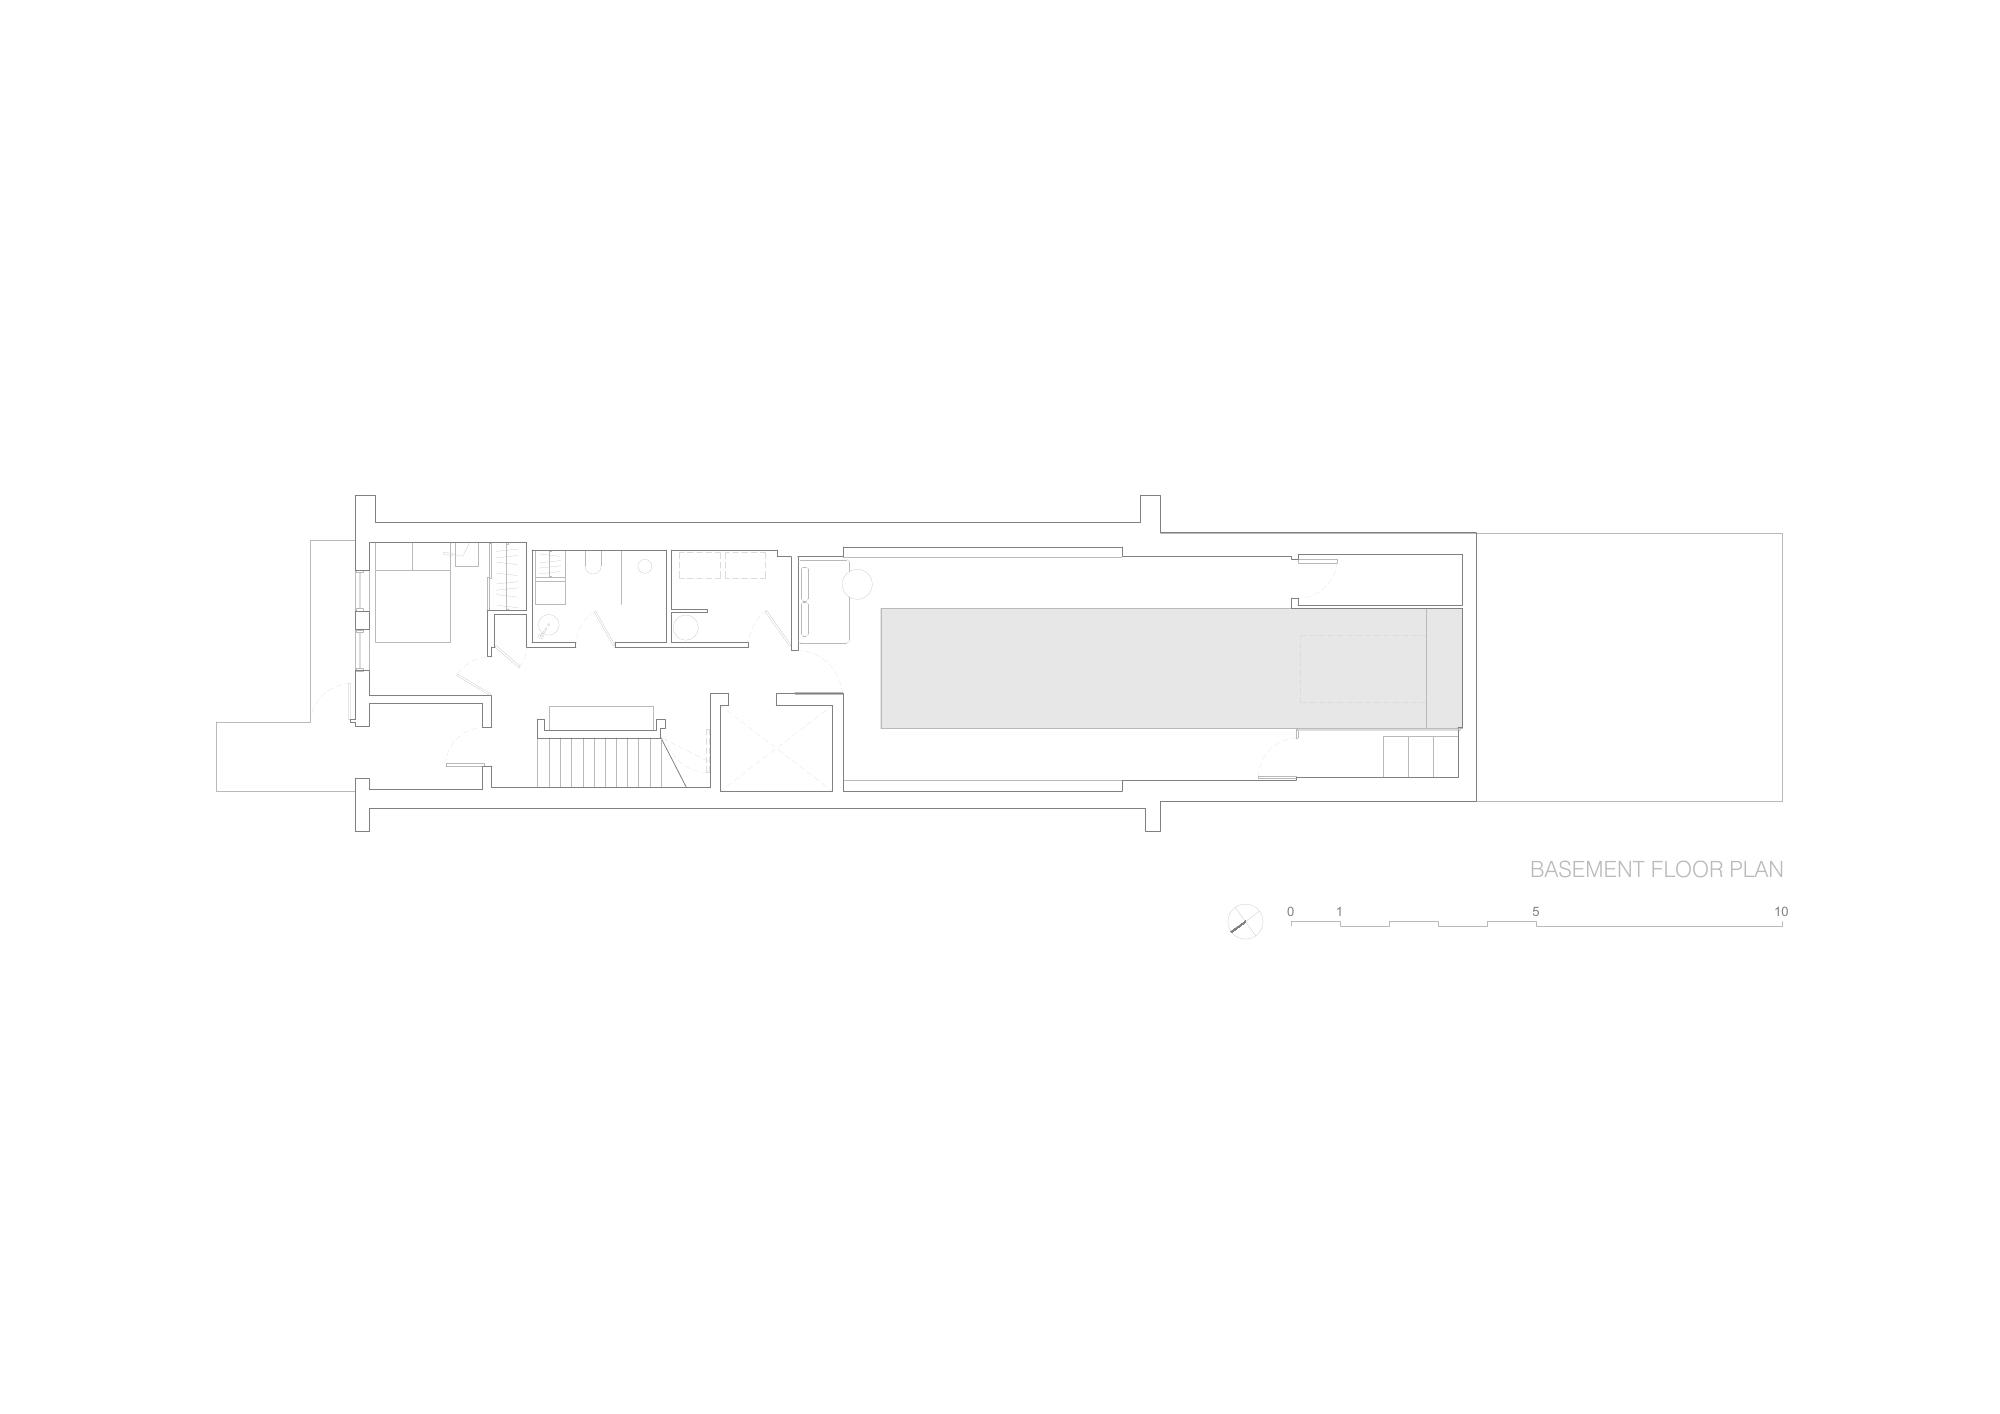 Brownstone Residence - Basement Floor Plan STUDIO ARTHUR CASAS}